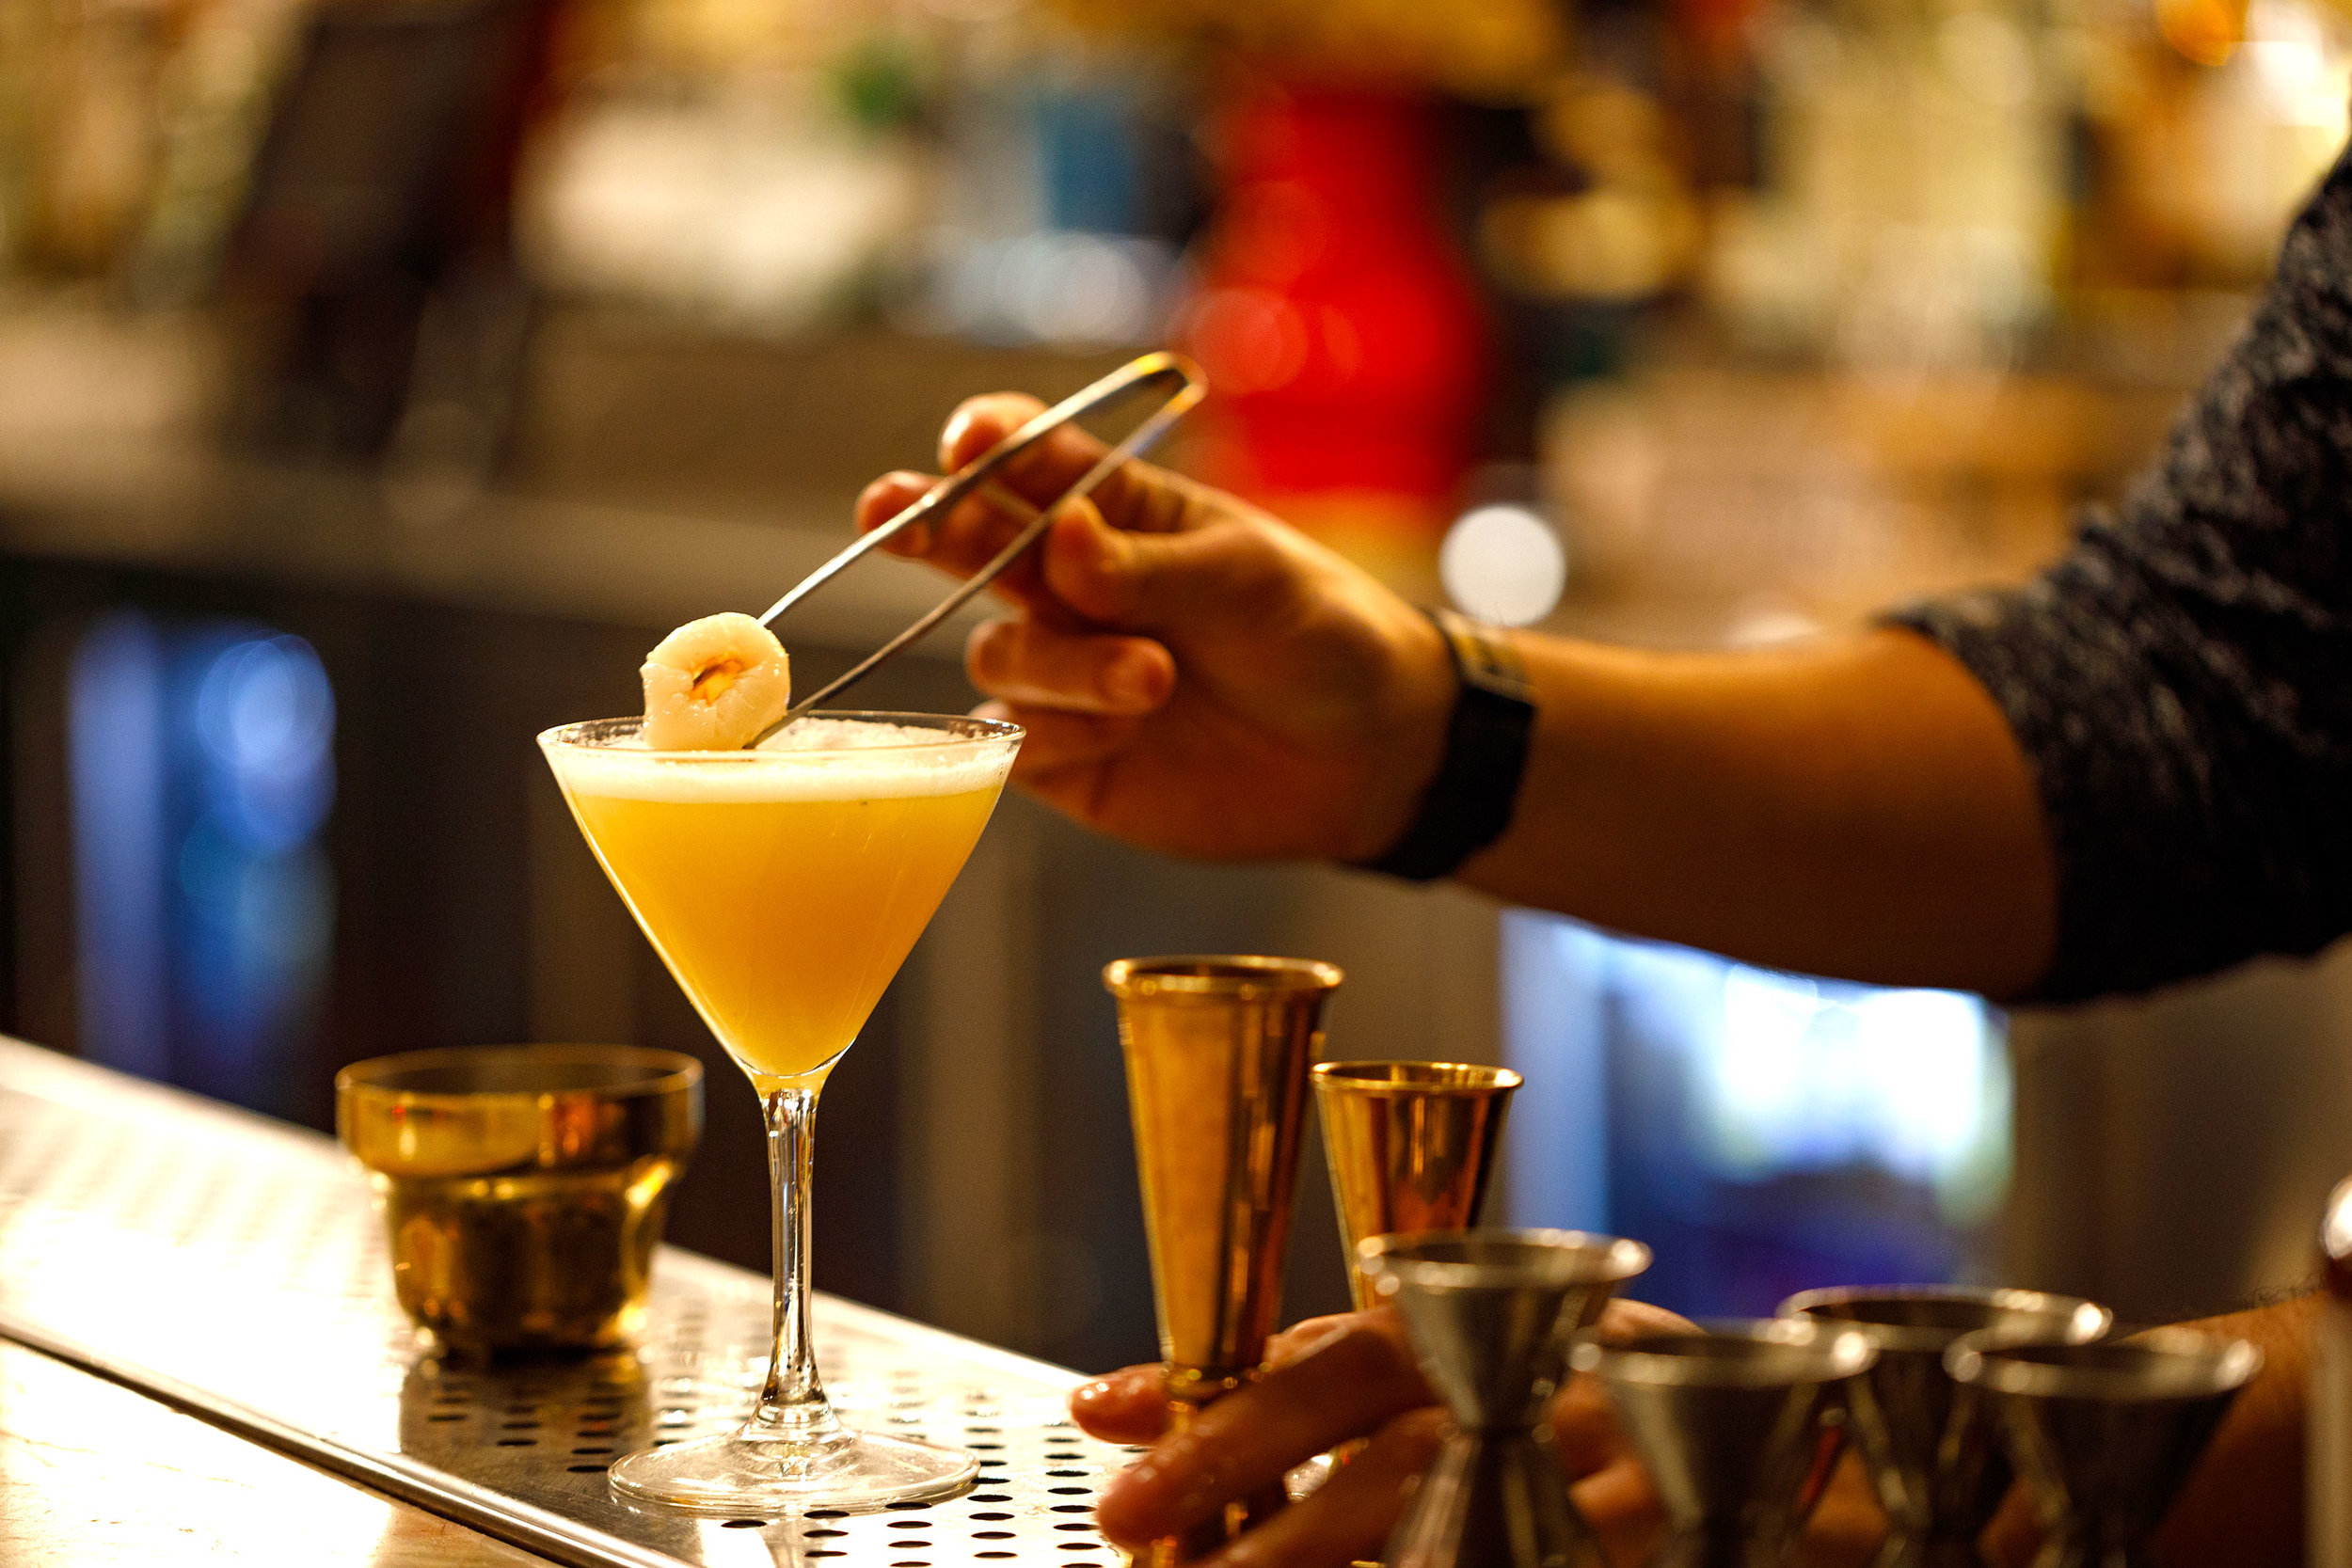 Making Lychee Martini